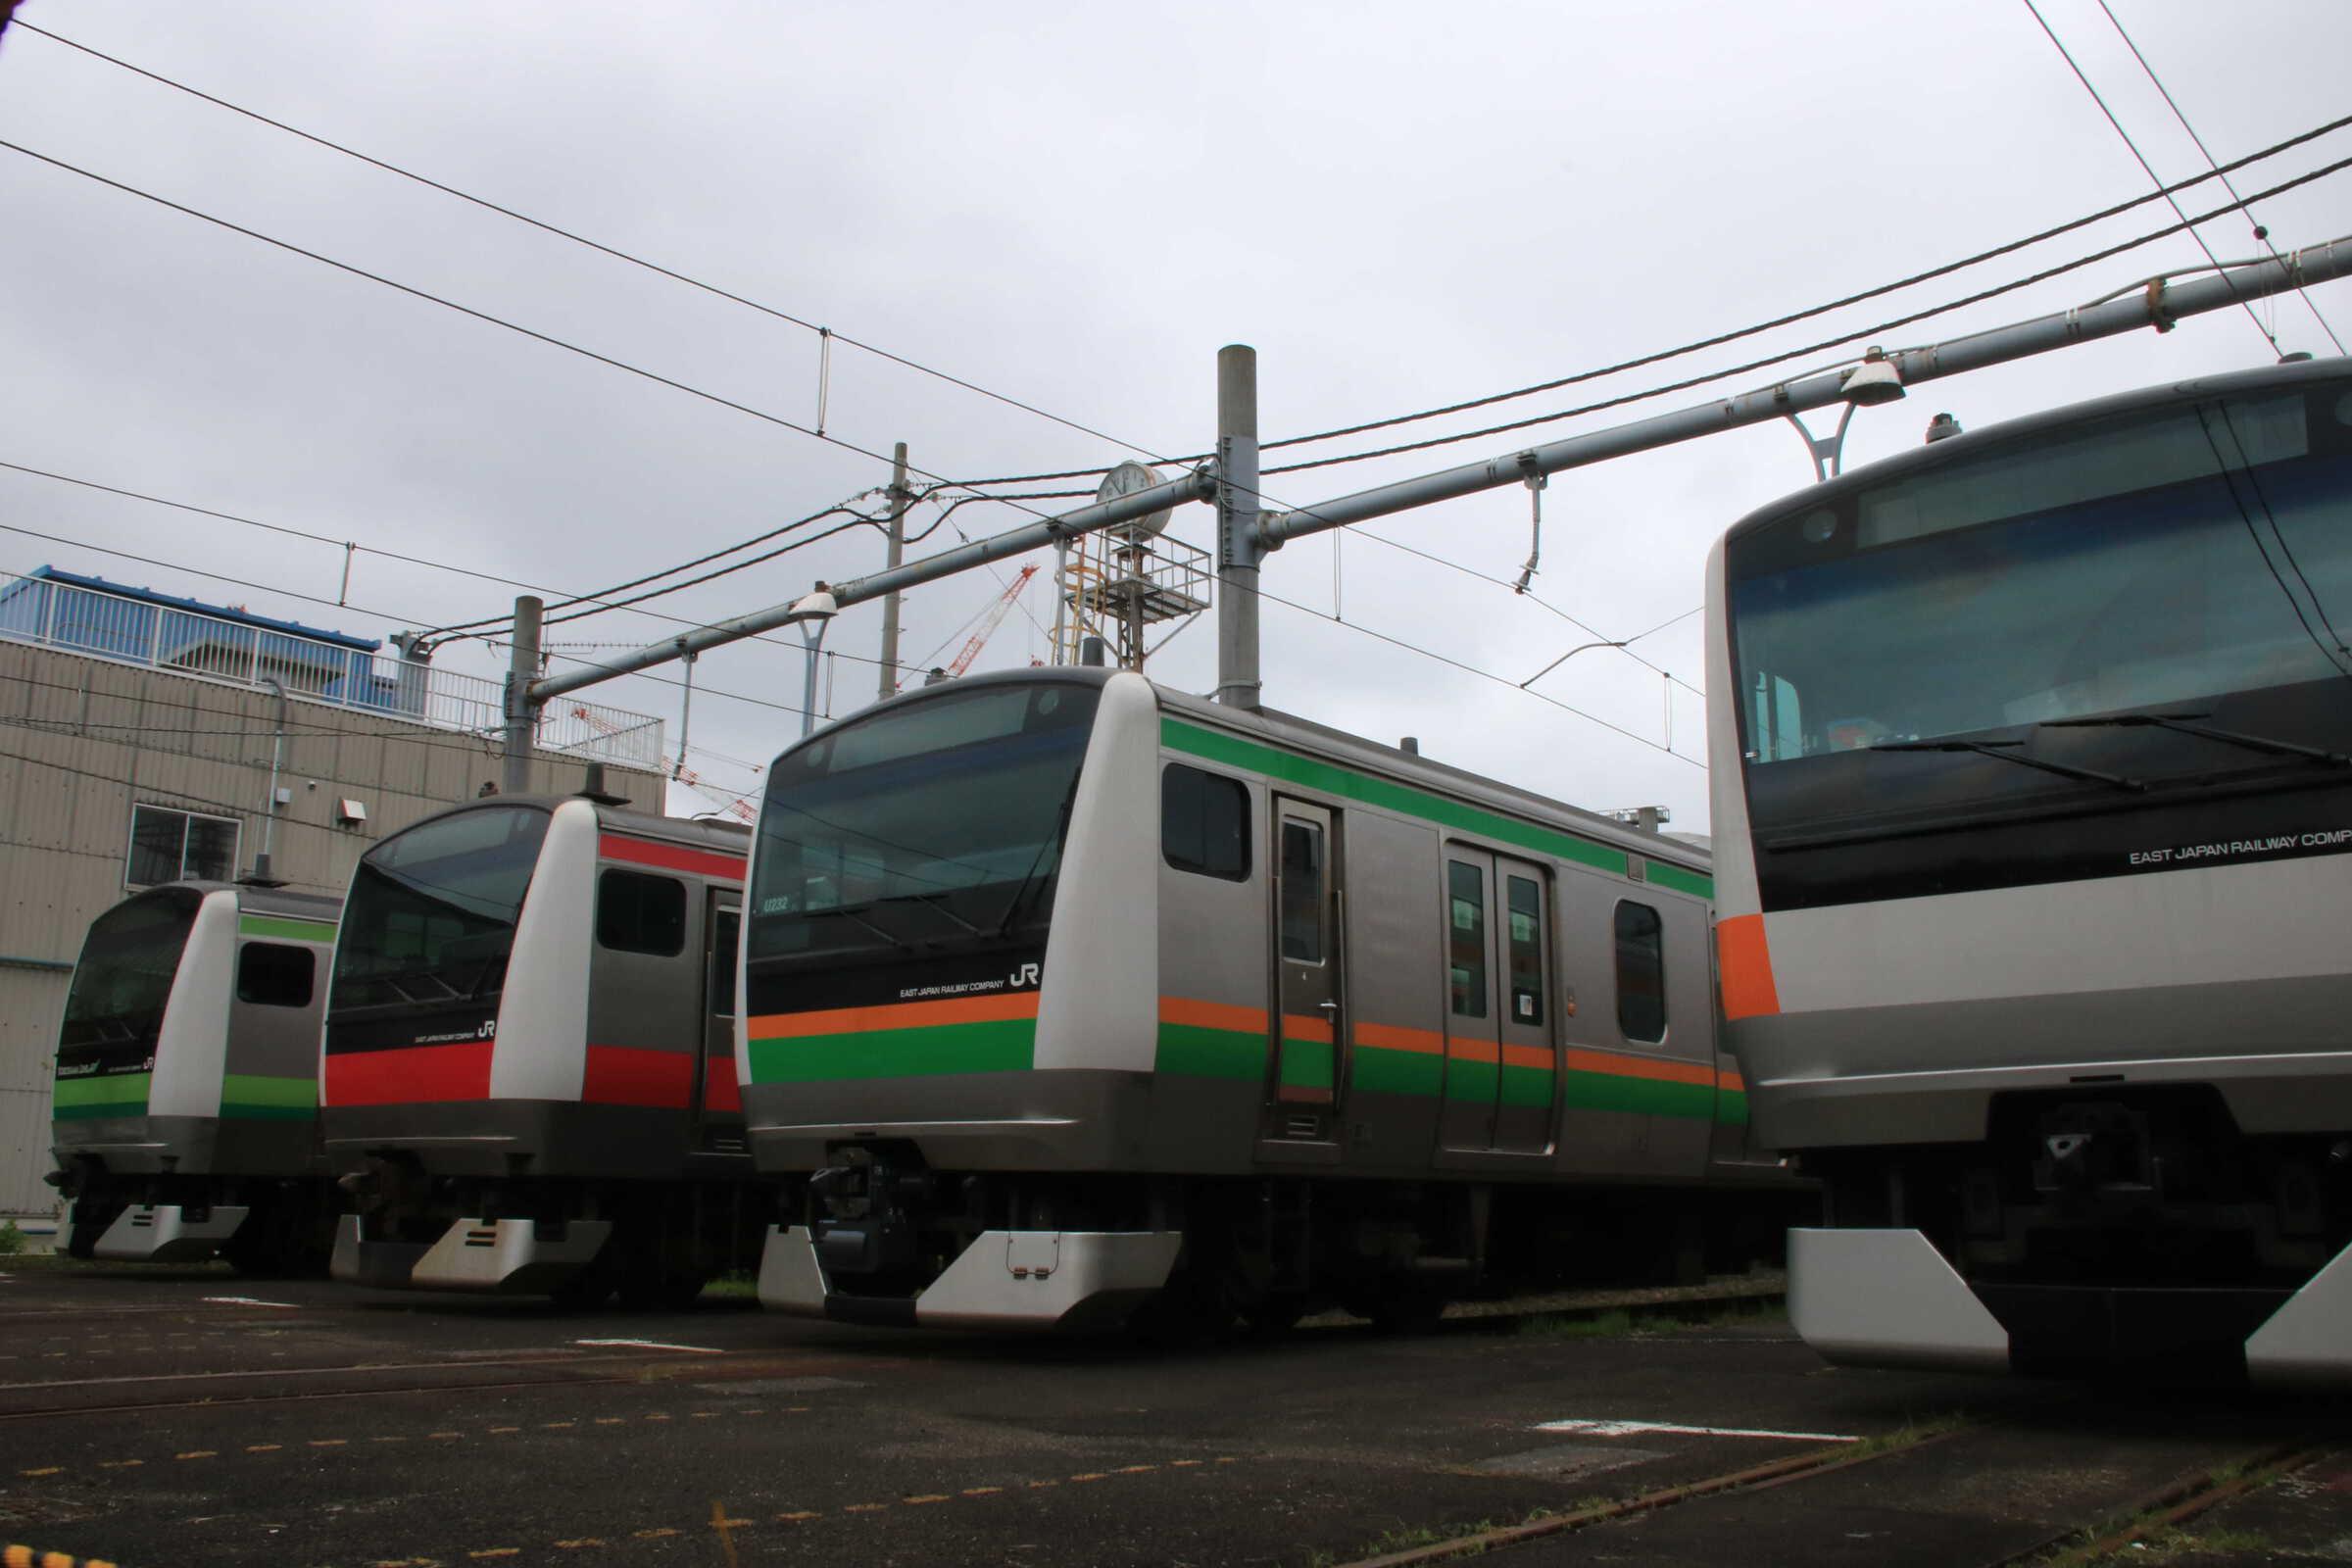 E233展示 八トタH44、宮ヤマU232、千ケヨ511、横クラH017